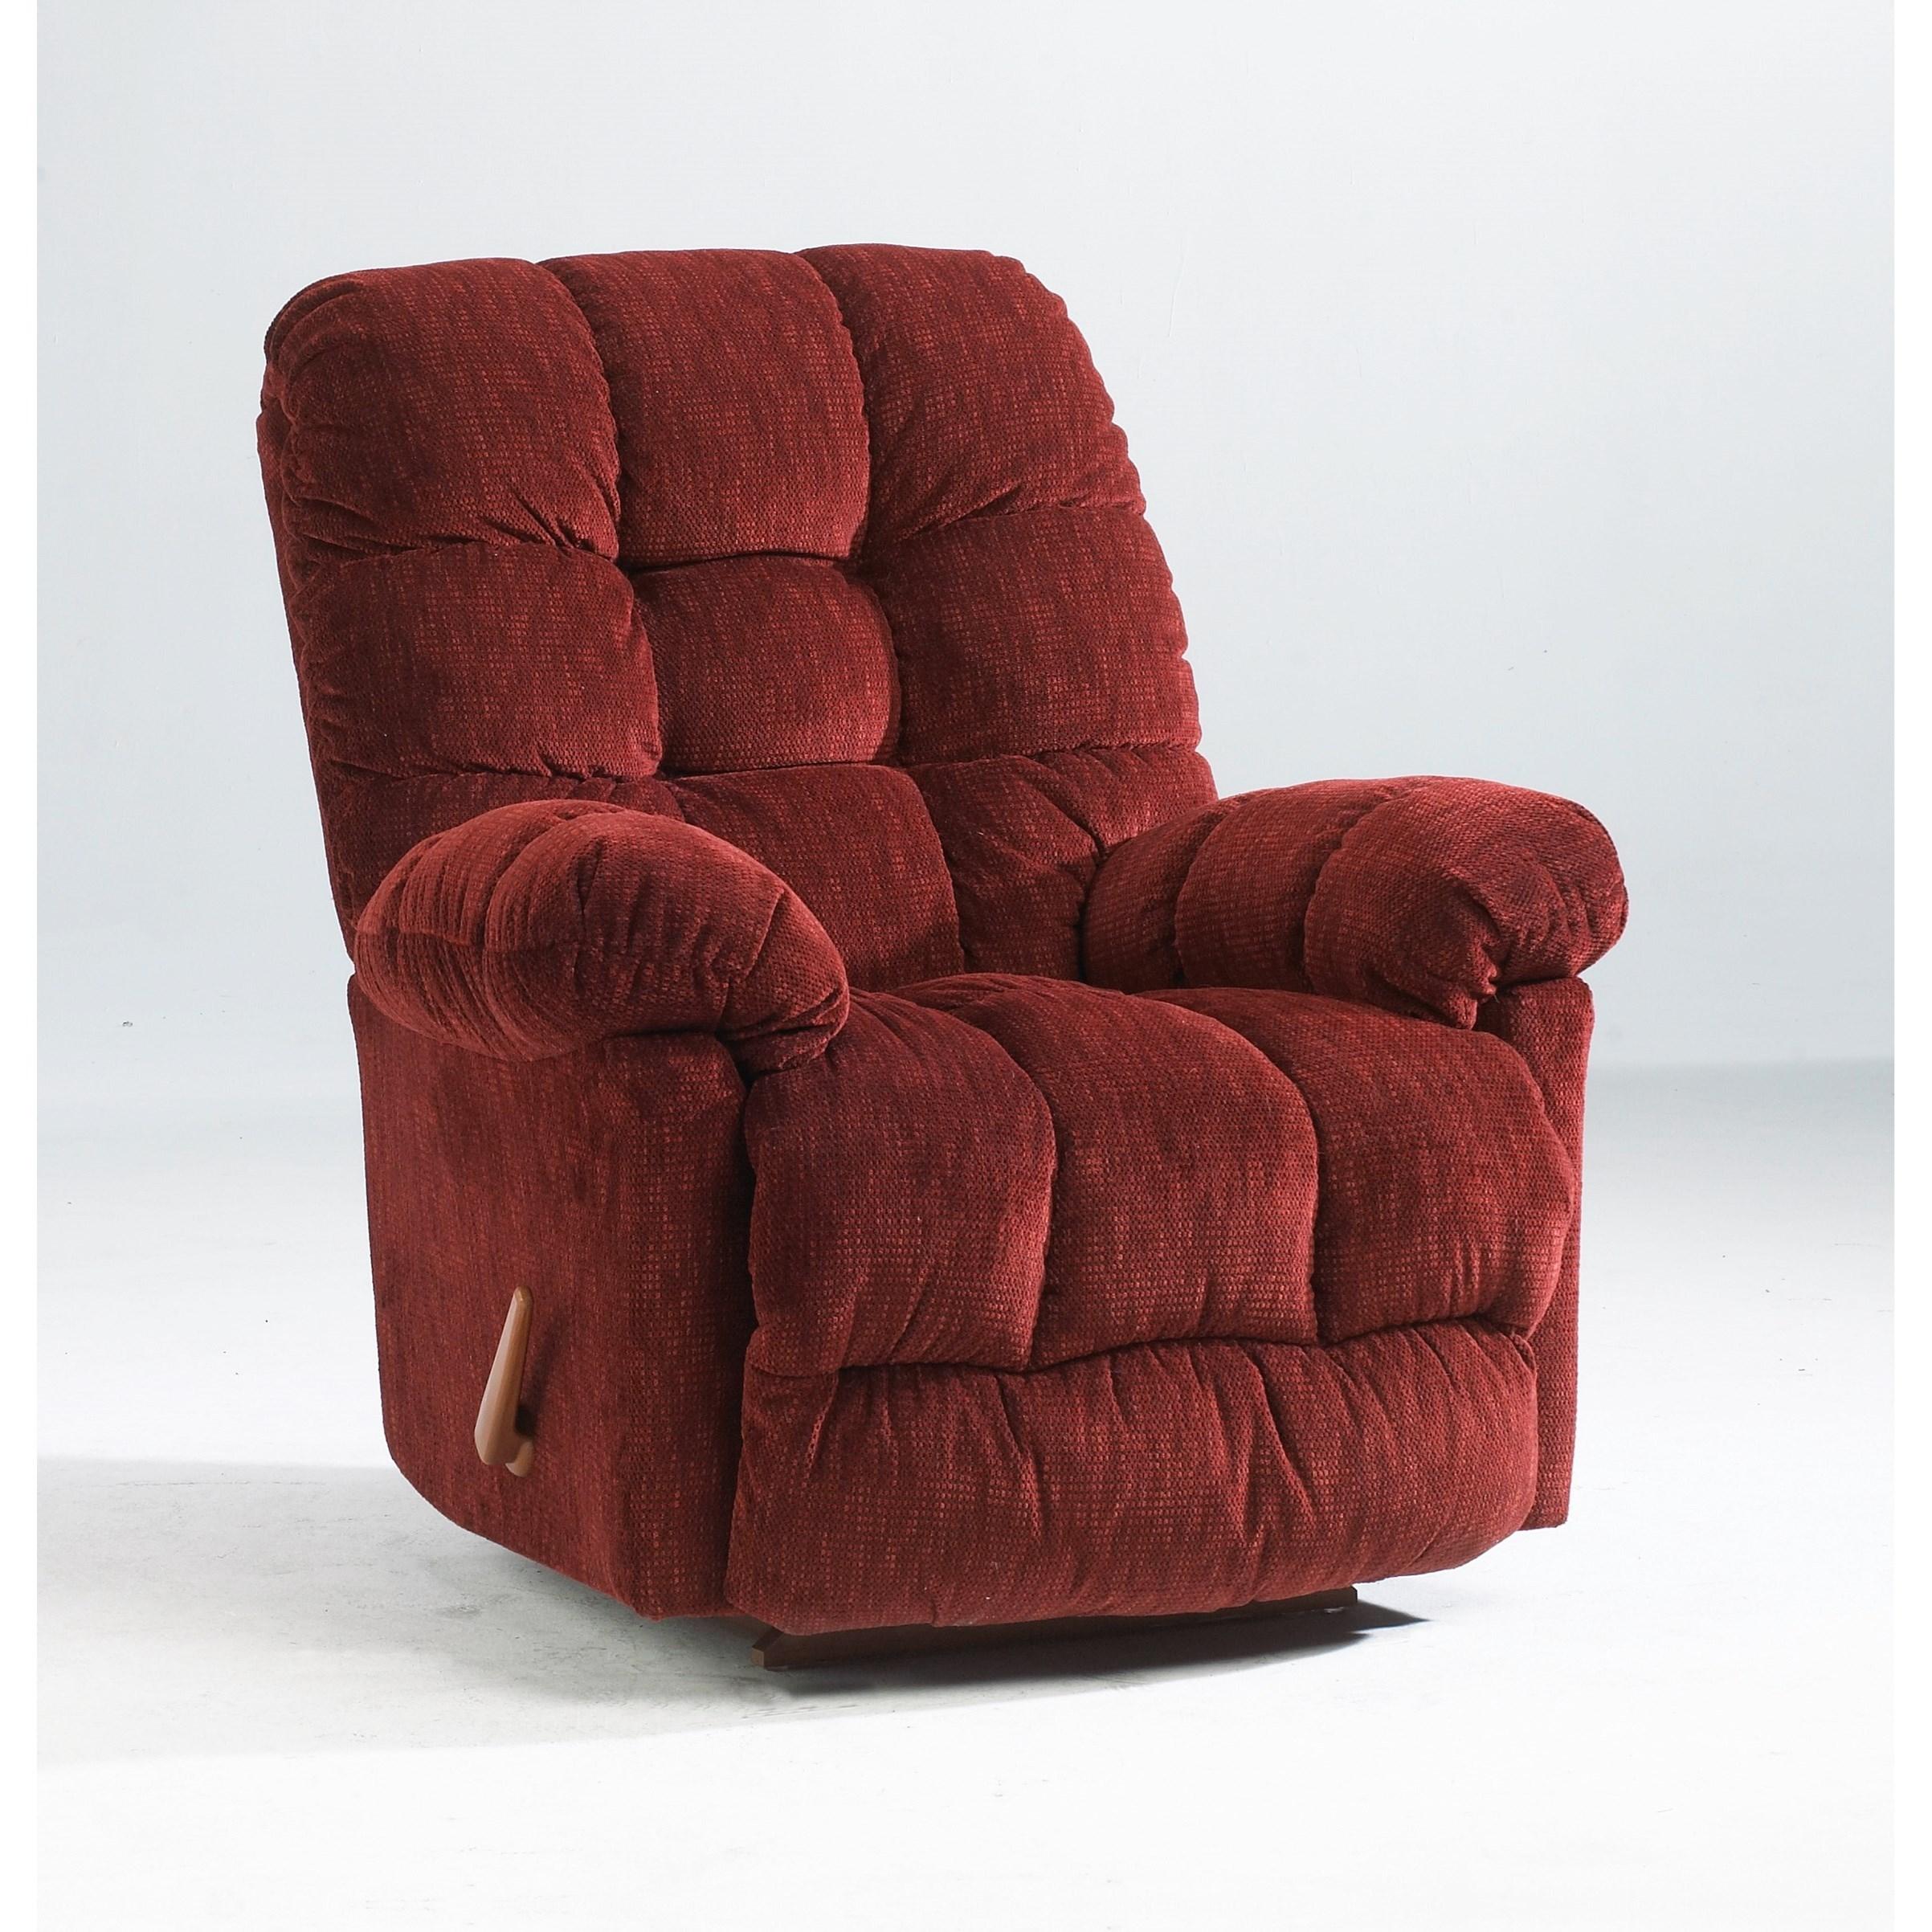 Medium Recliners Brosmer Rocker Recliner w/ Massage & Heat by Best Home Furnishings at Baer's Furniture